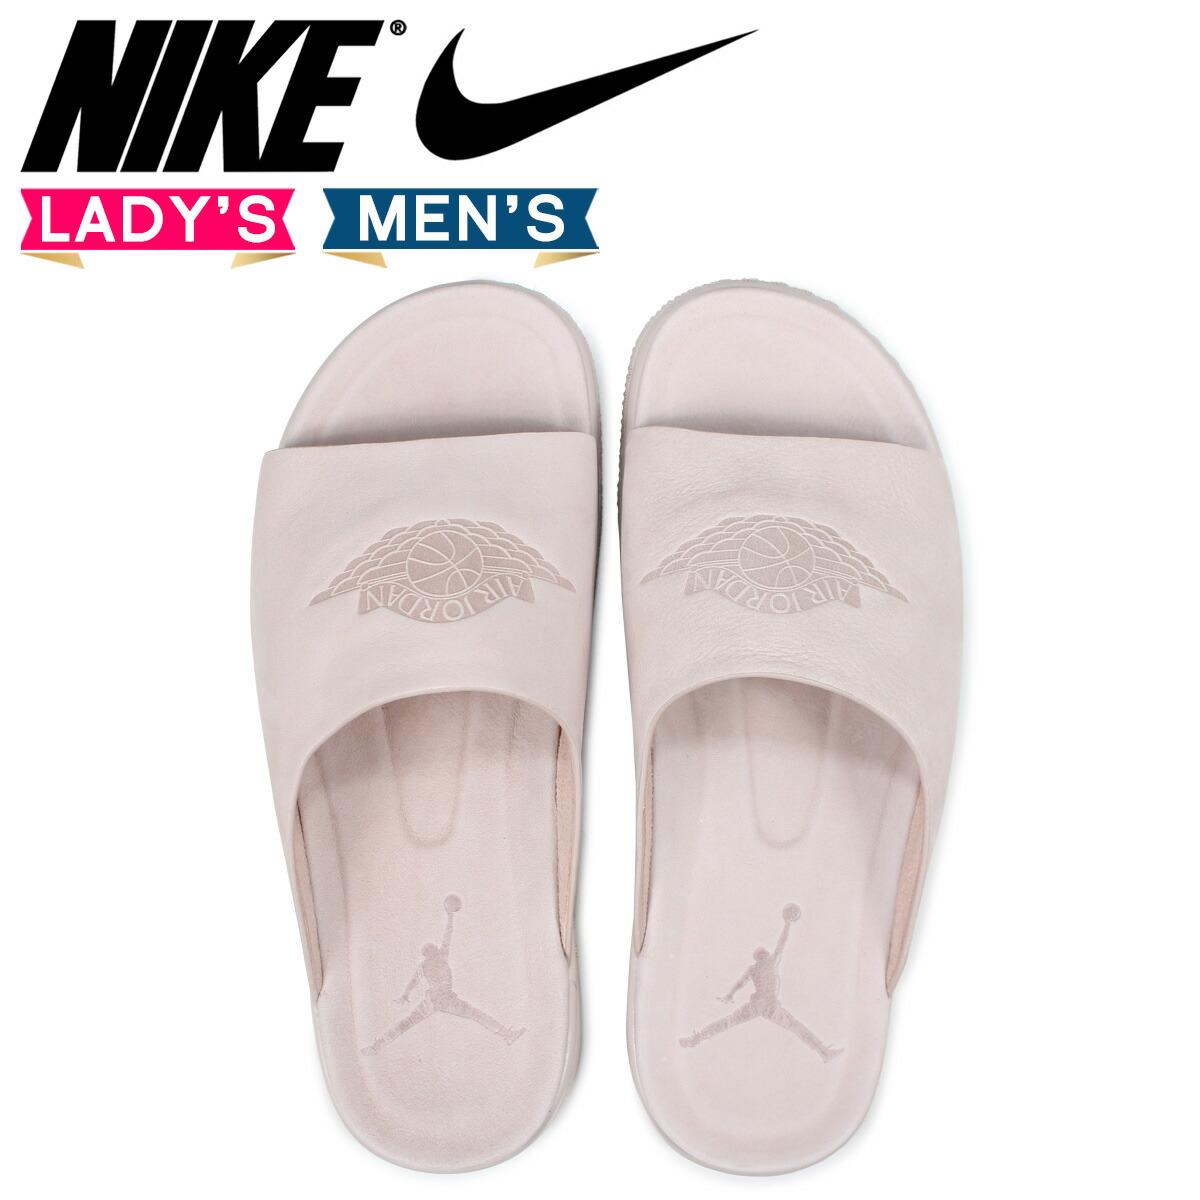 6cf876ca02b SneaK Online Shop: Nike NIKE sandals Jordan Lady's men WMNS JORDAN ...